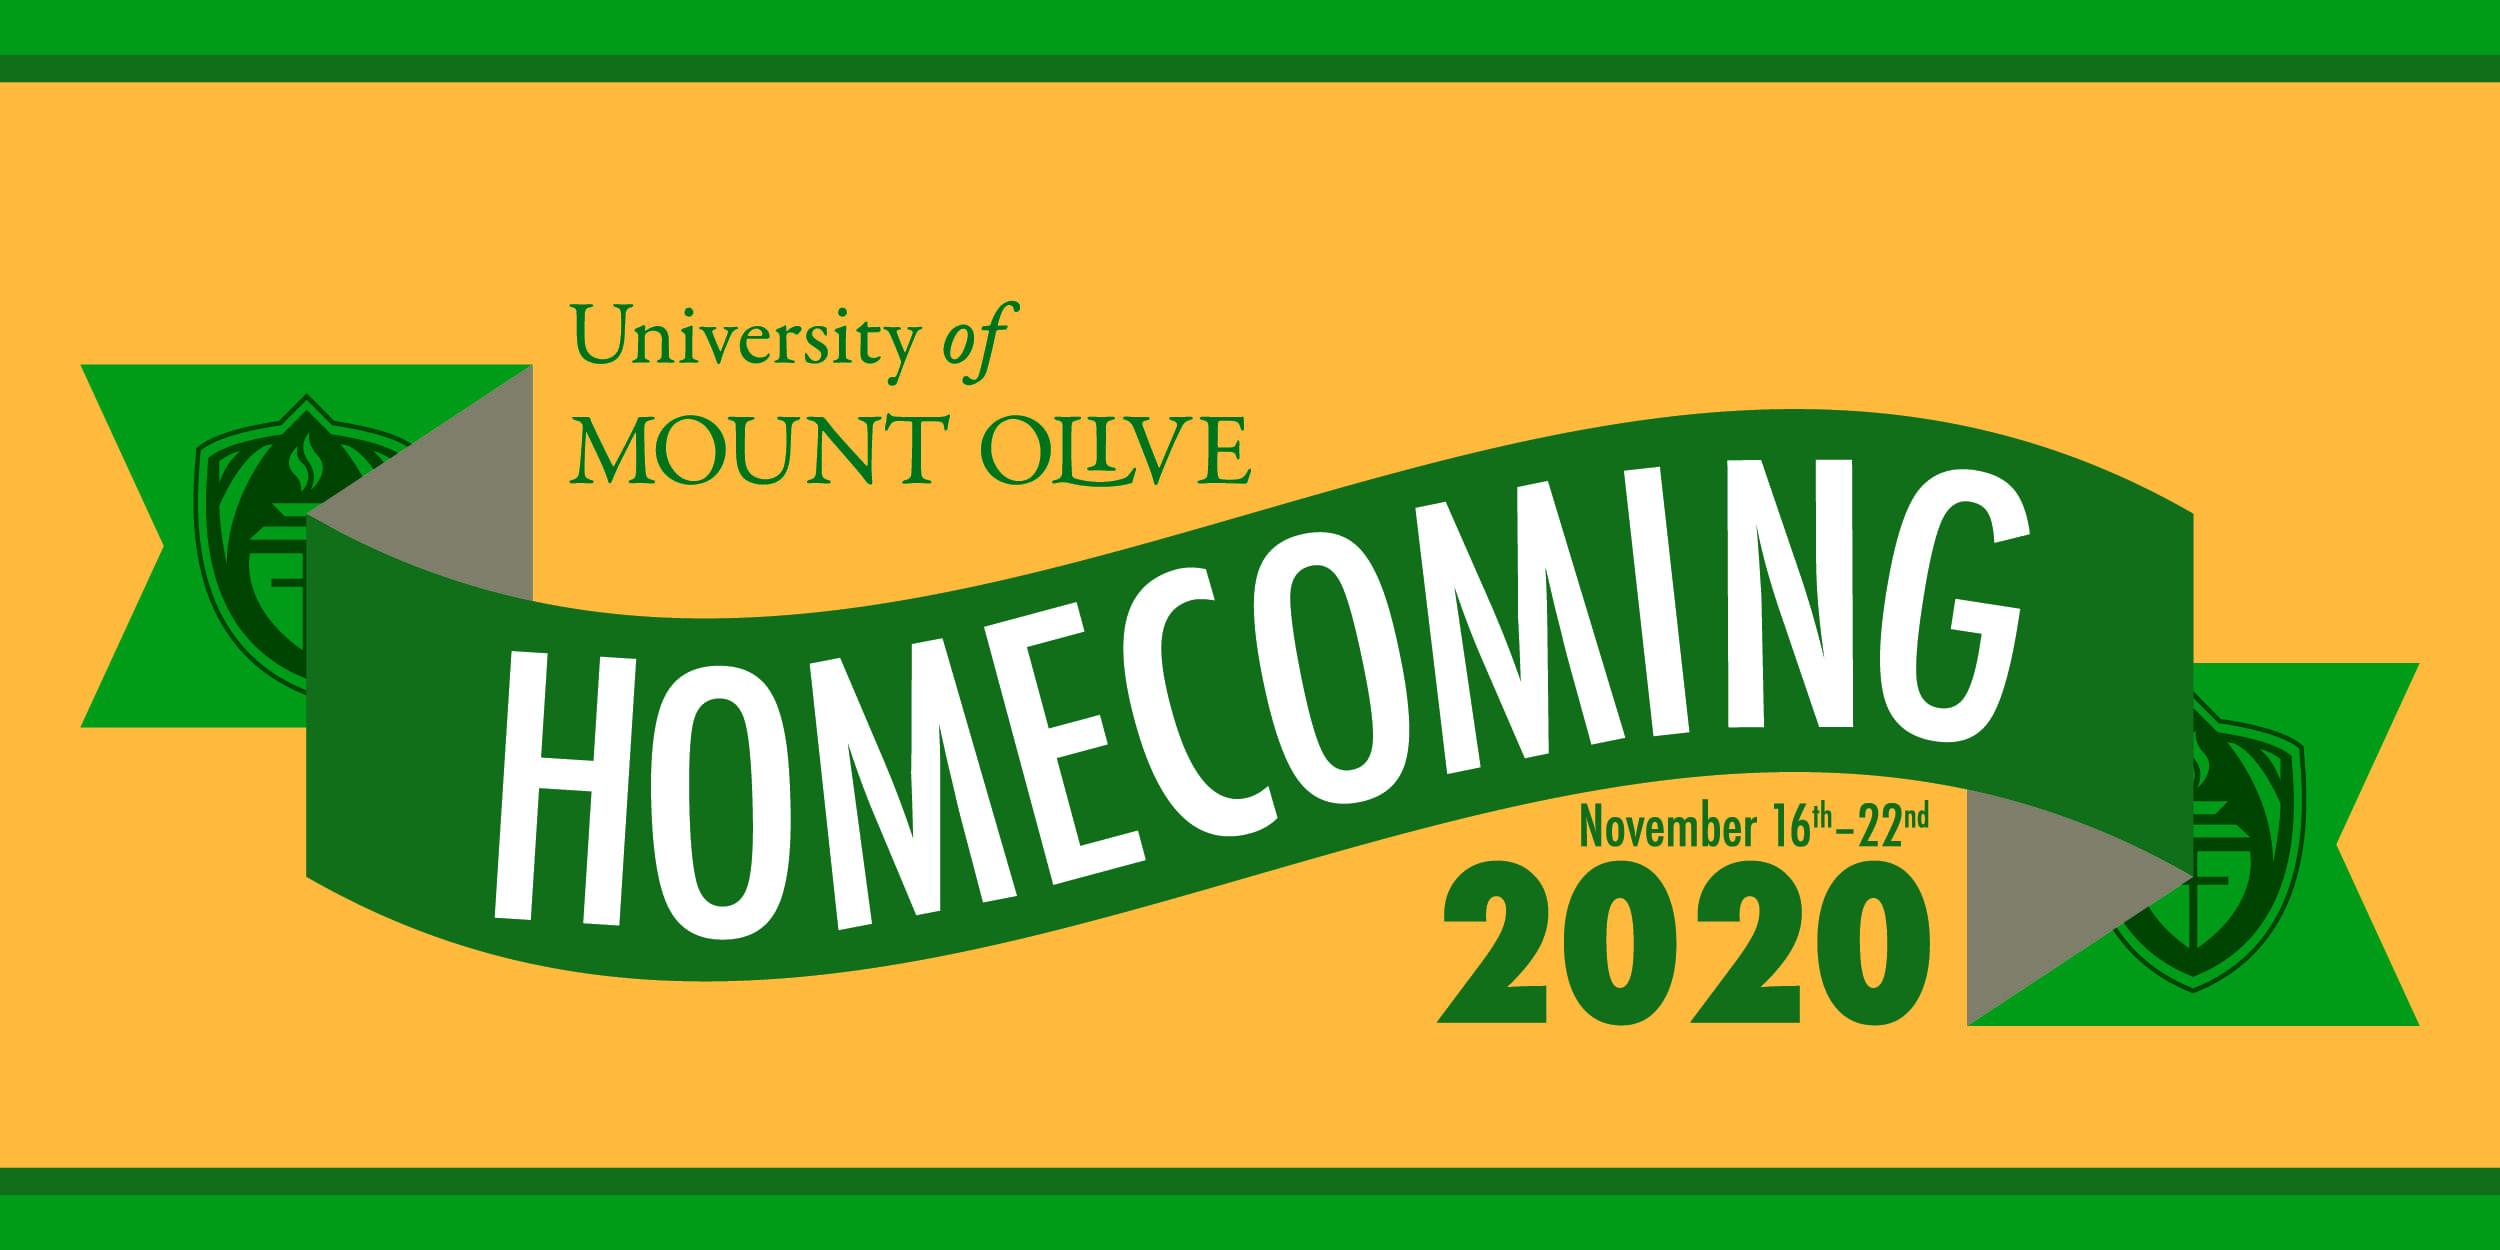 Virtual UMO Alumni Homecoming Event Planned